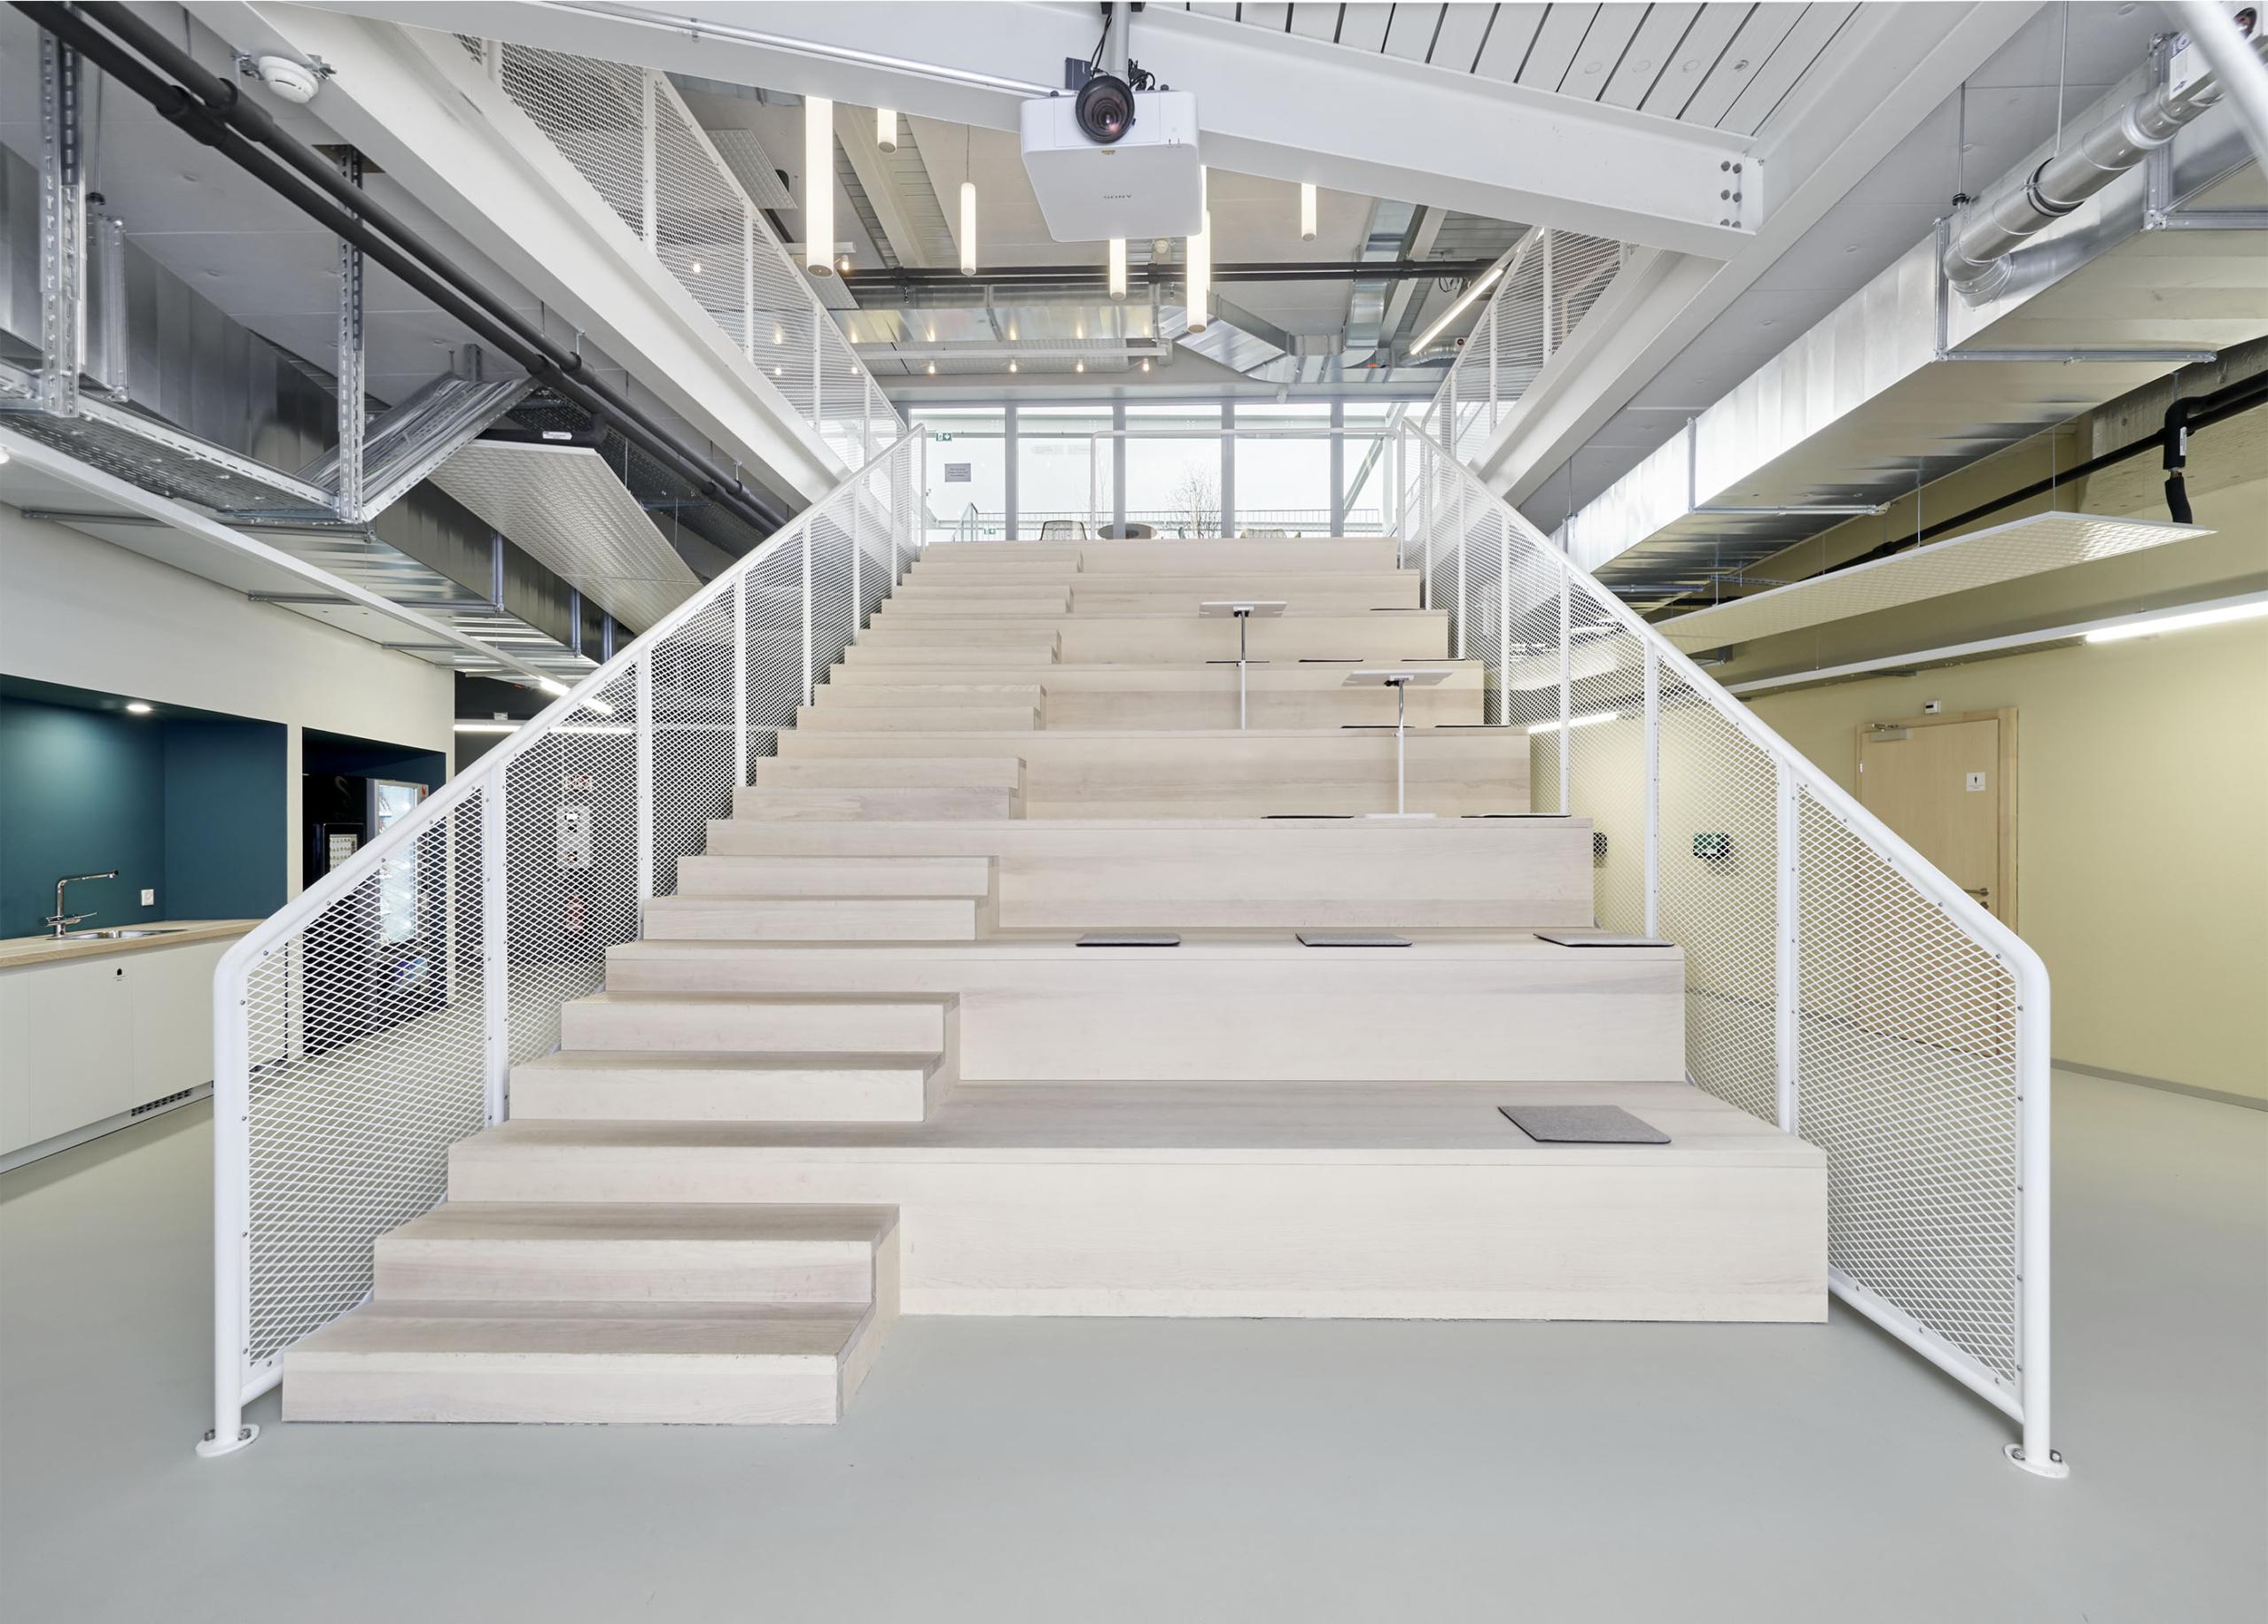 escaliers1285